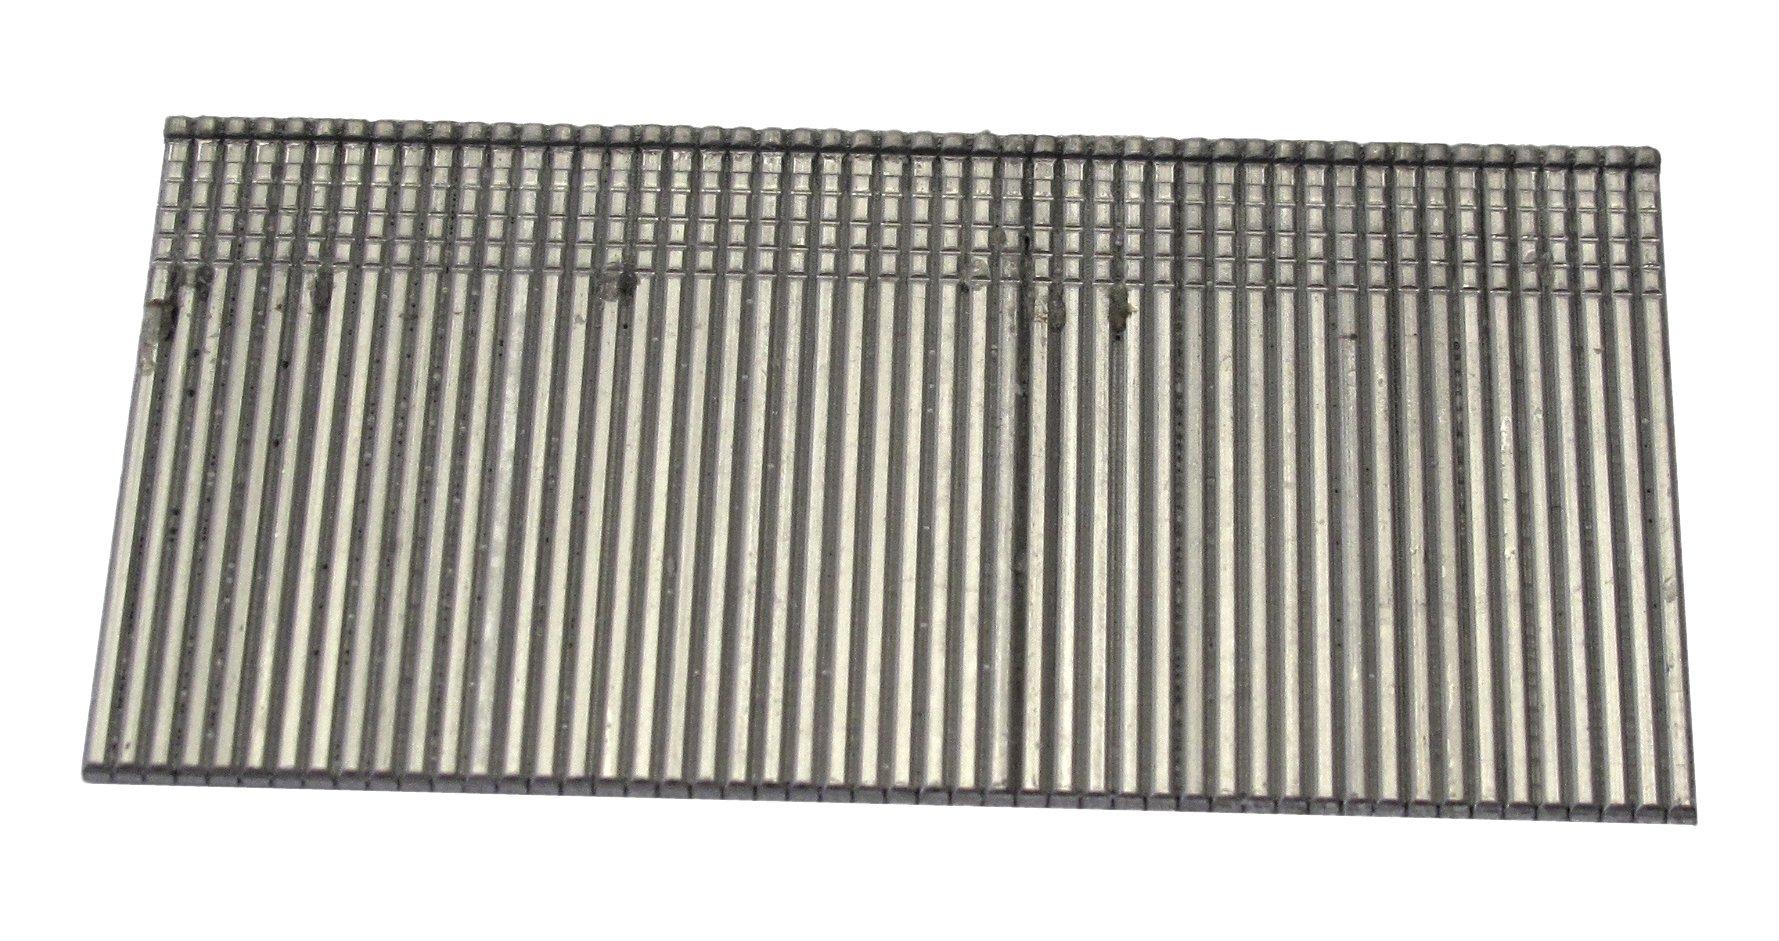 Grip Rite Prime Guard MAXB64900 1-1/2-inch 316 Stainless Steel 18-gauge Brad Nail, 500 per Belt Clip